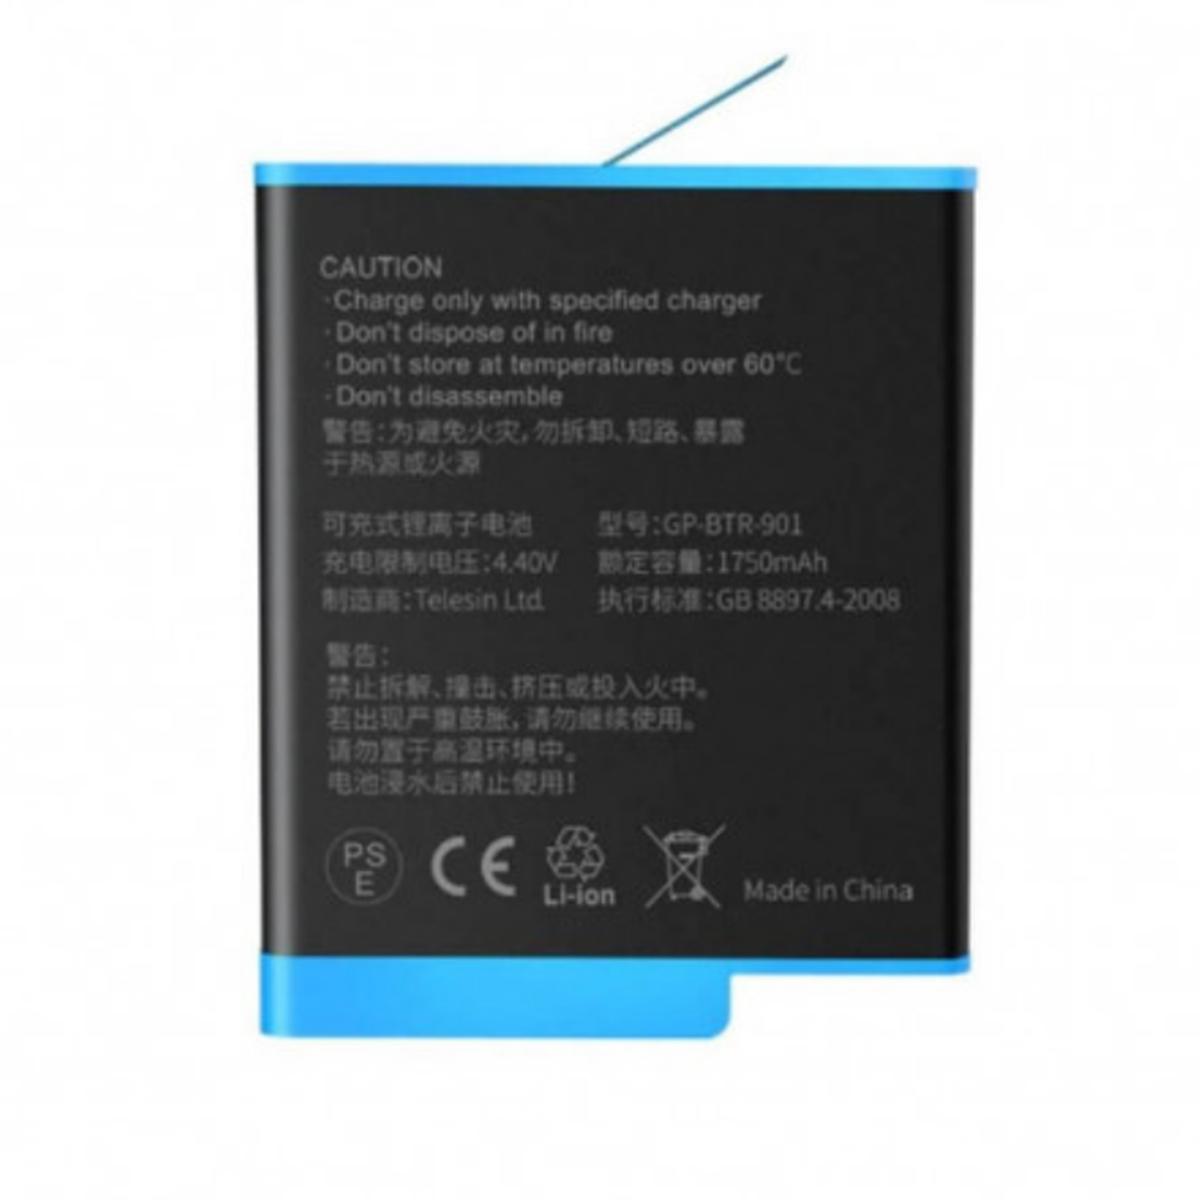 Bateria para GoPro Hero9 Black - 1750mAh Li-ion - Telesin